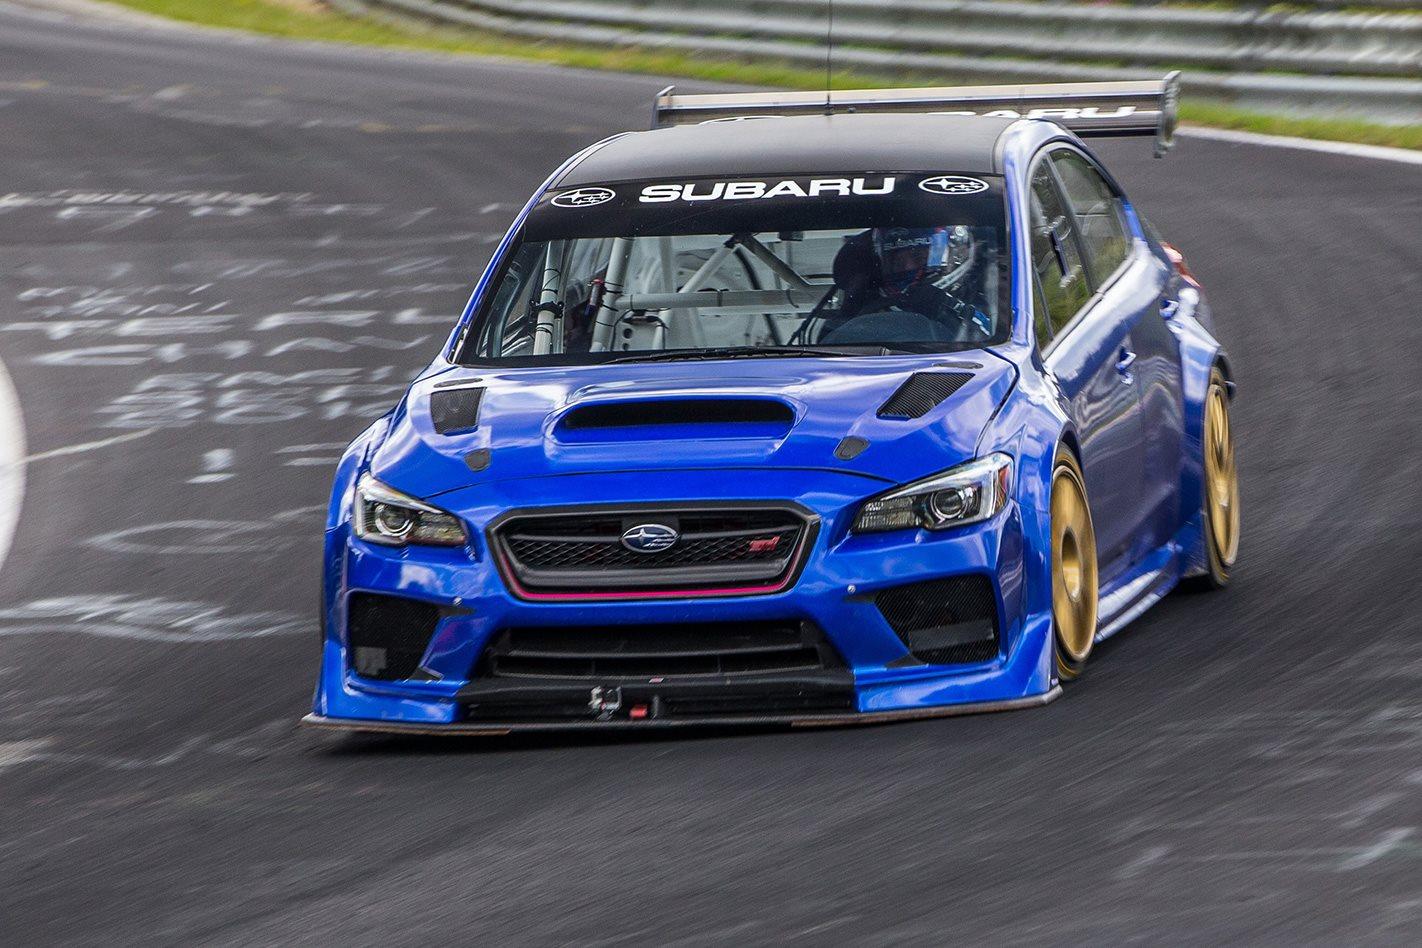 Subaru WRX STI Type RA front